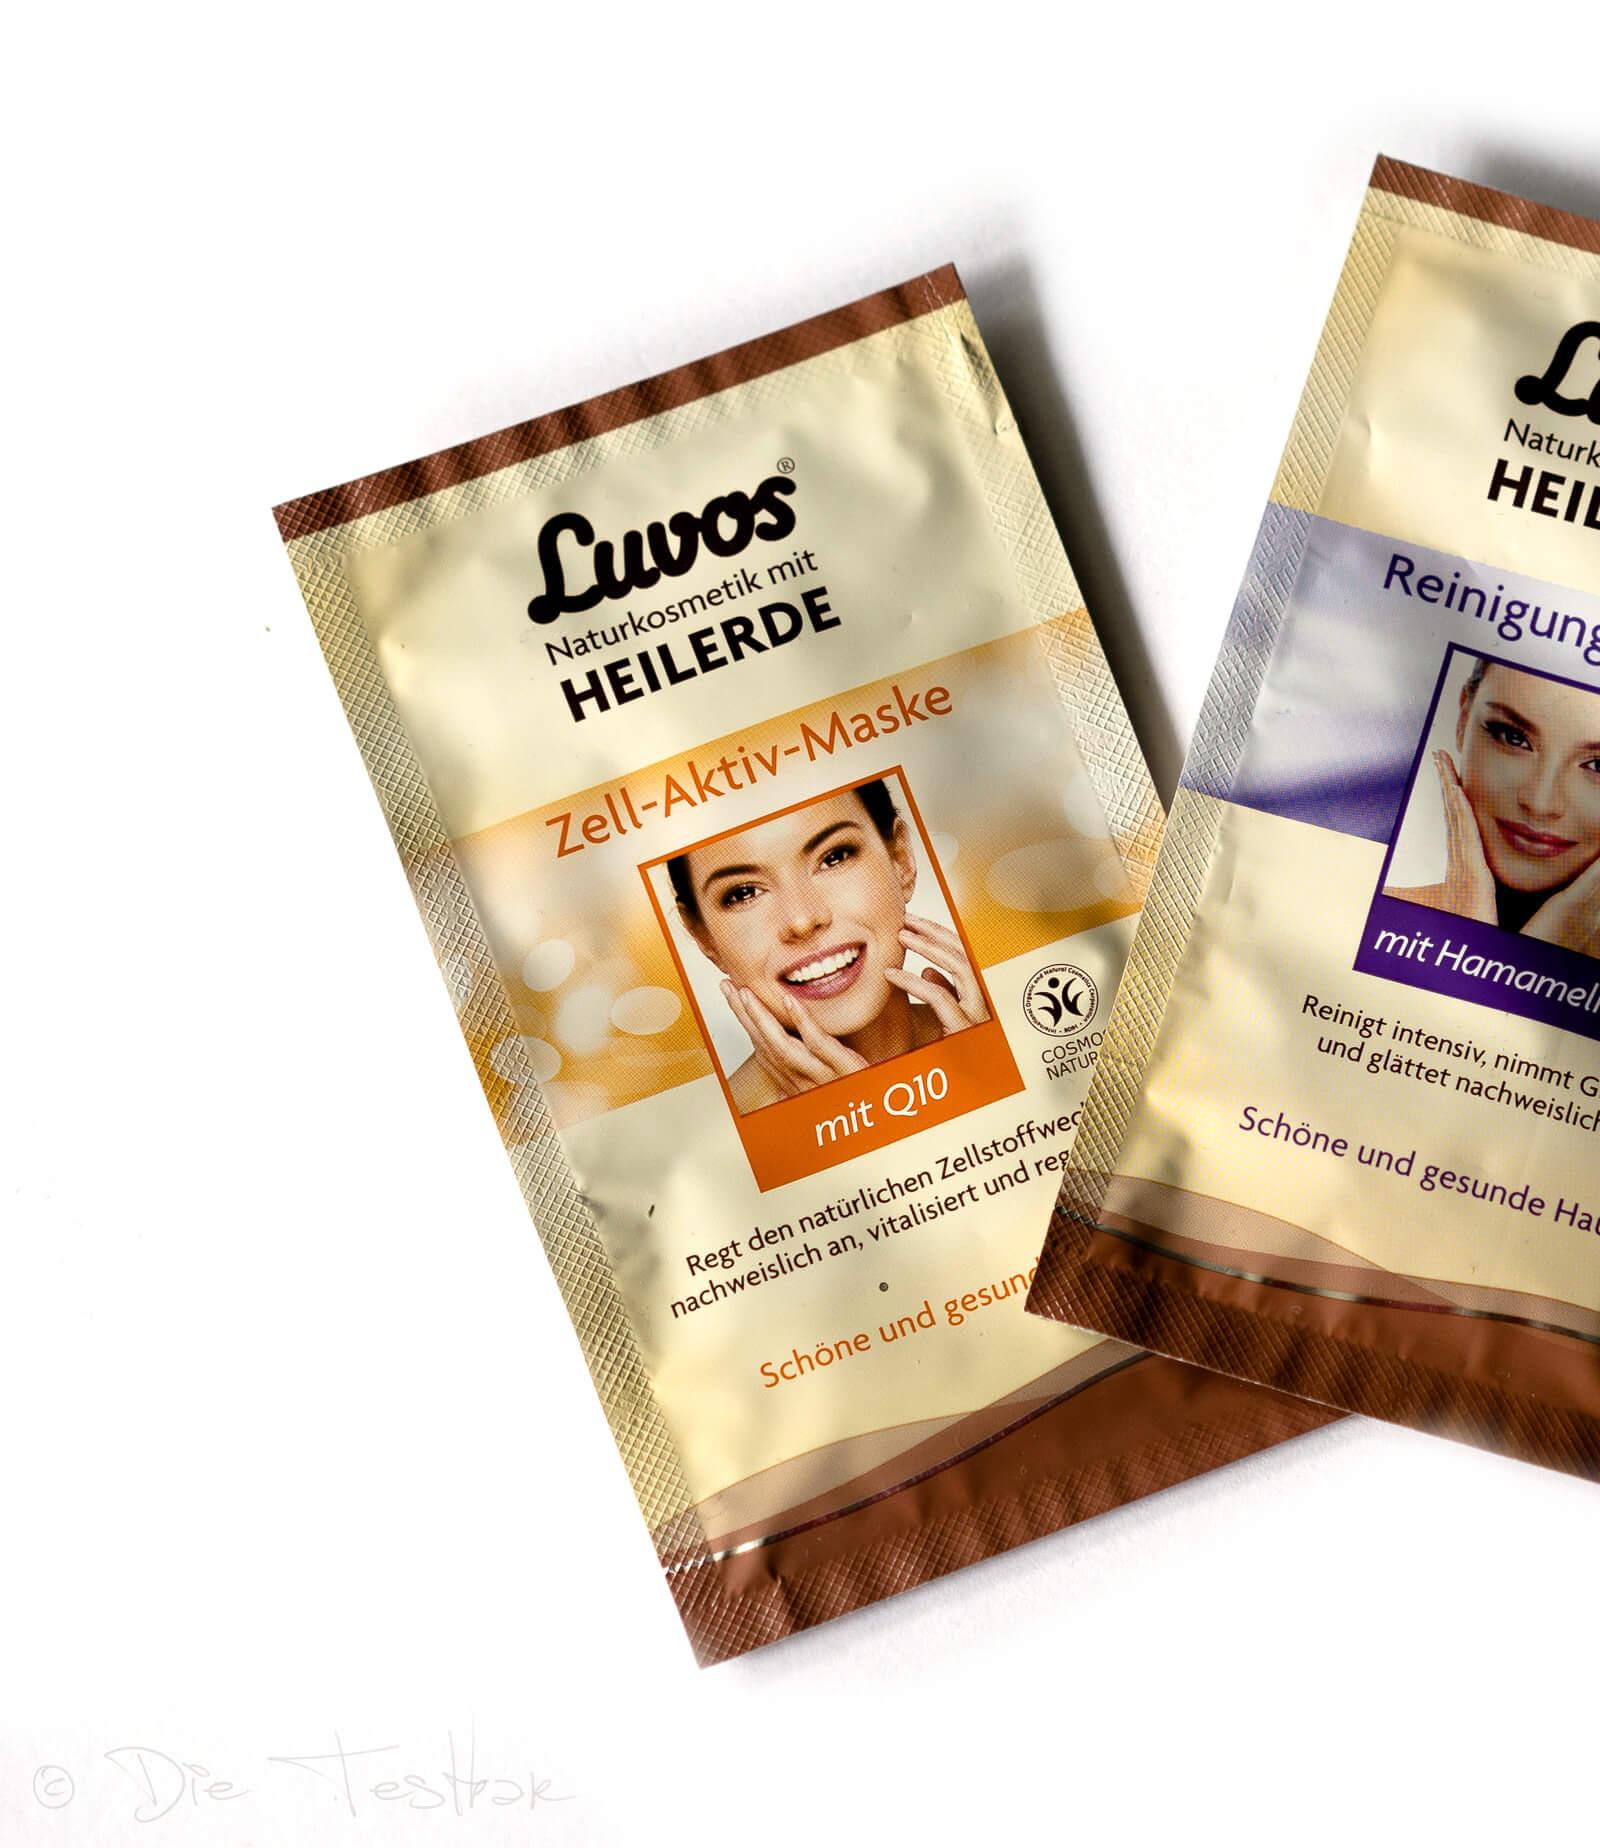 Luvos Zell-Aktiv-Maske mit Q10